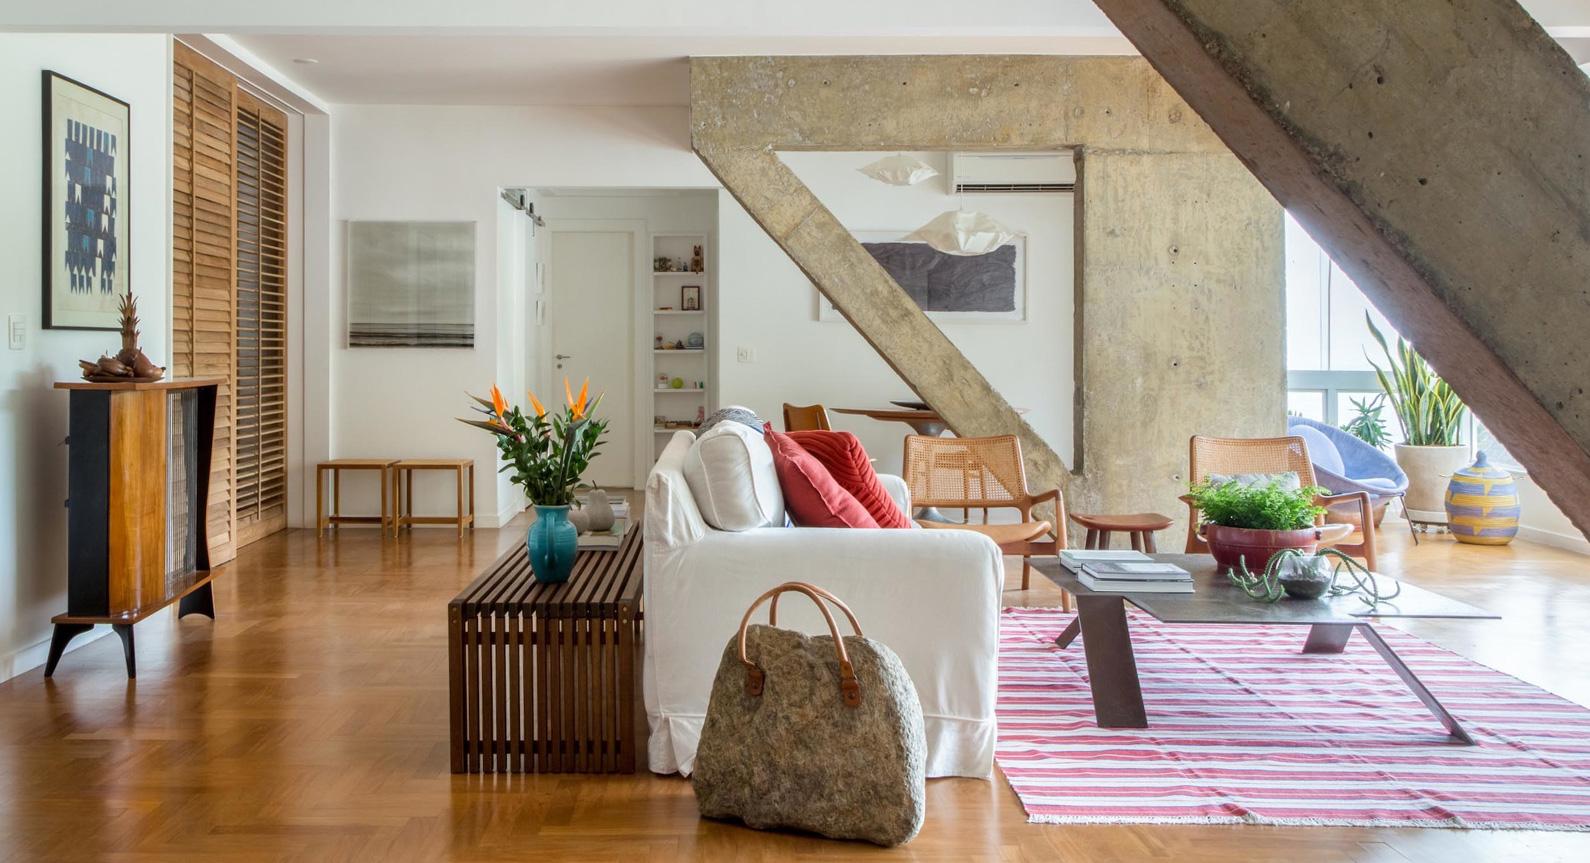 Estudio Chao's Apartment Renovation Reveals Beautiful Concrete Beams